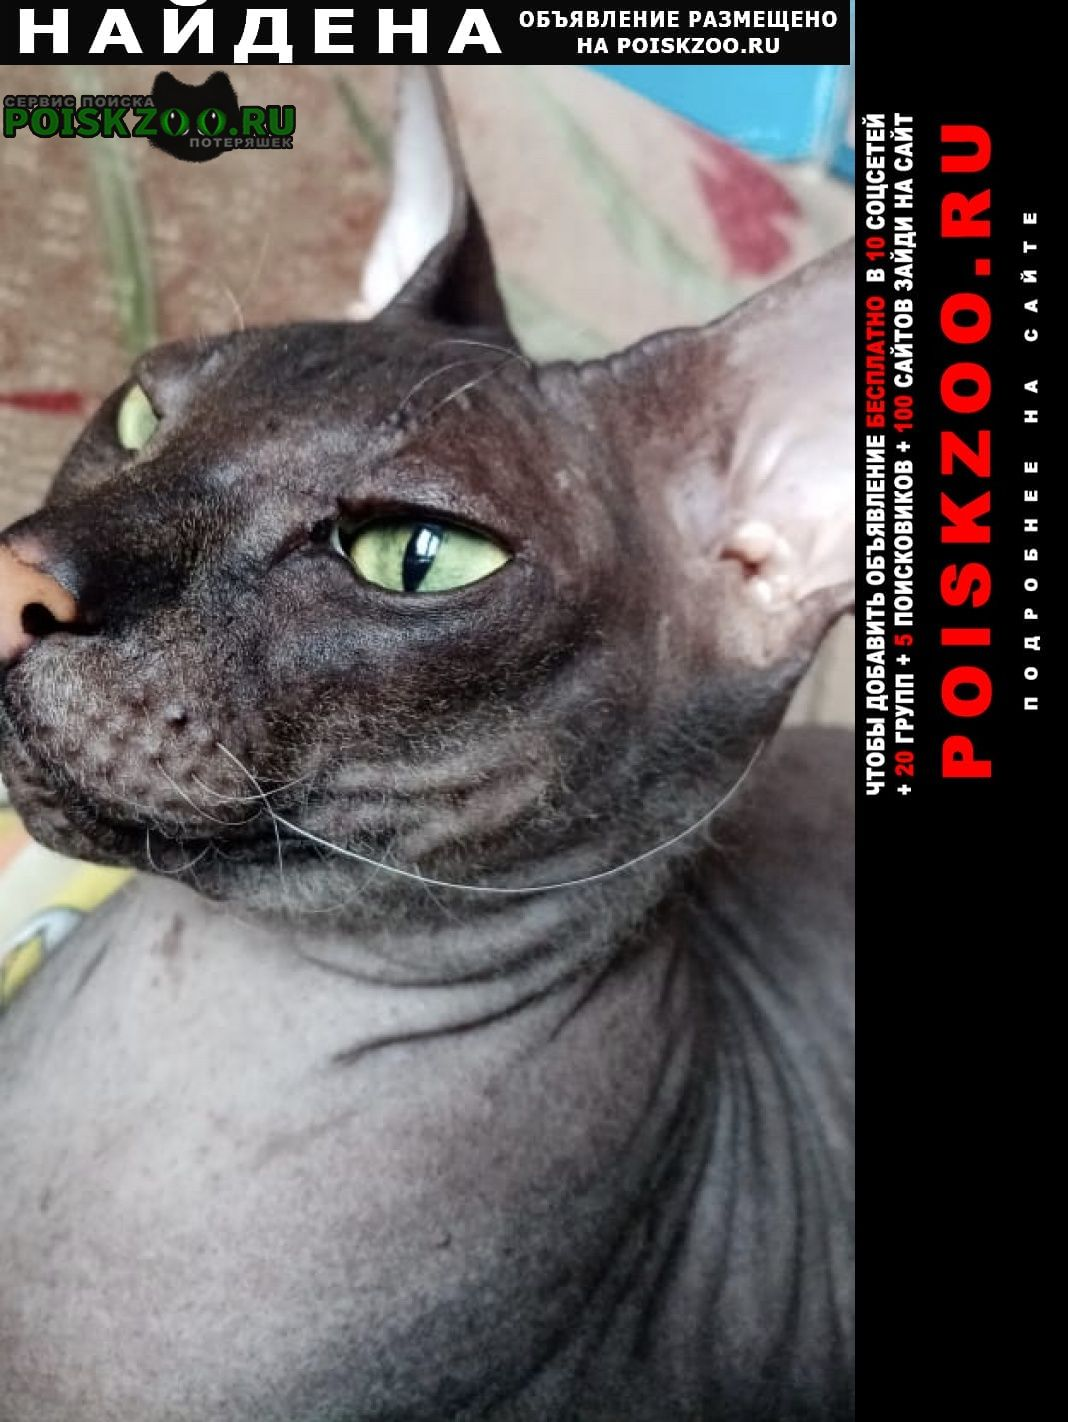 Найдена кошка сфинкс Стерлитамак